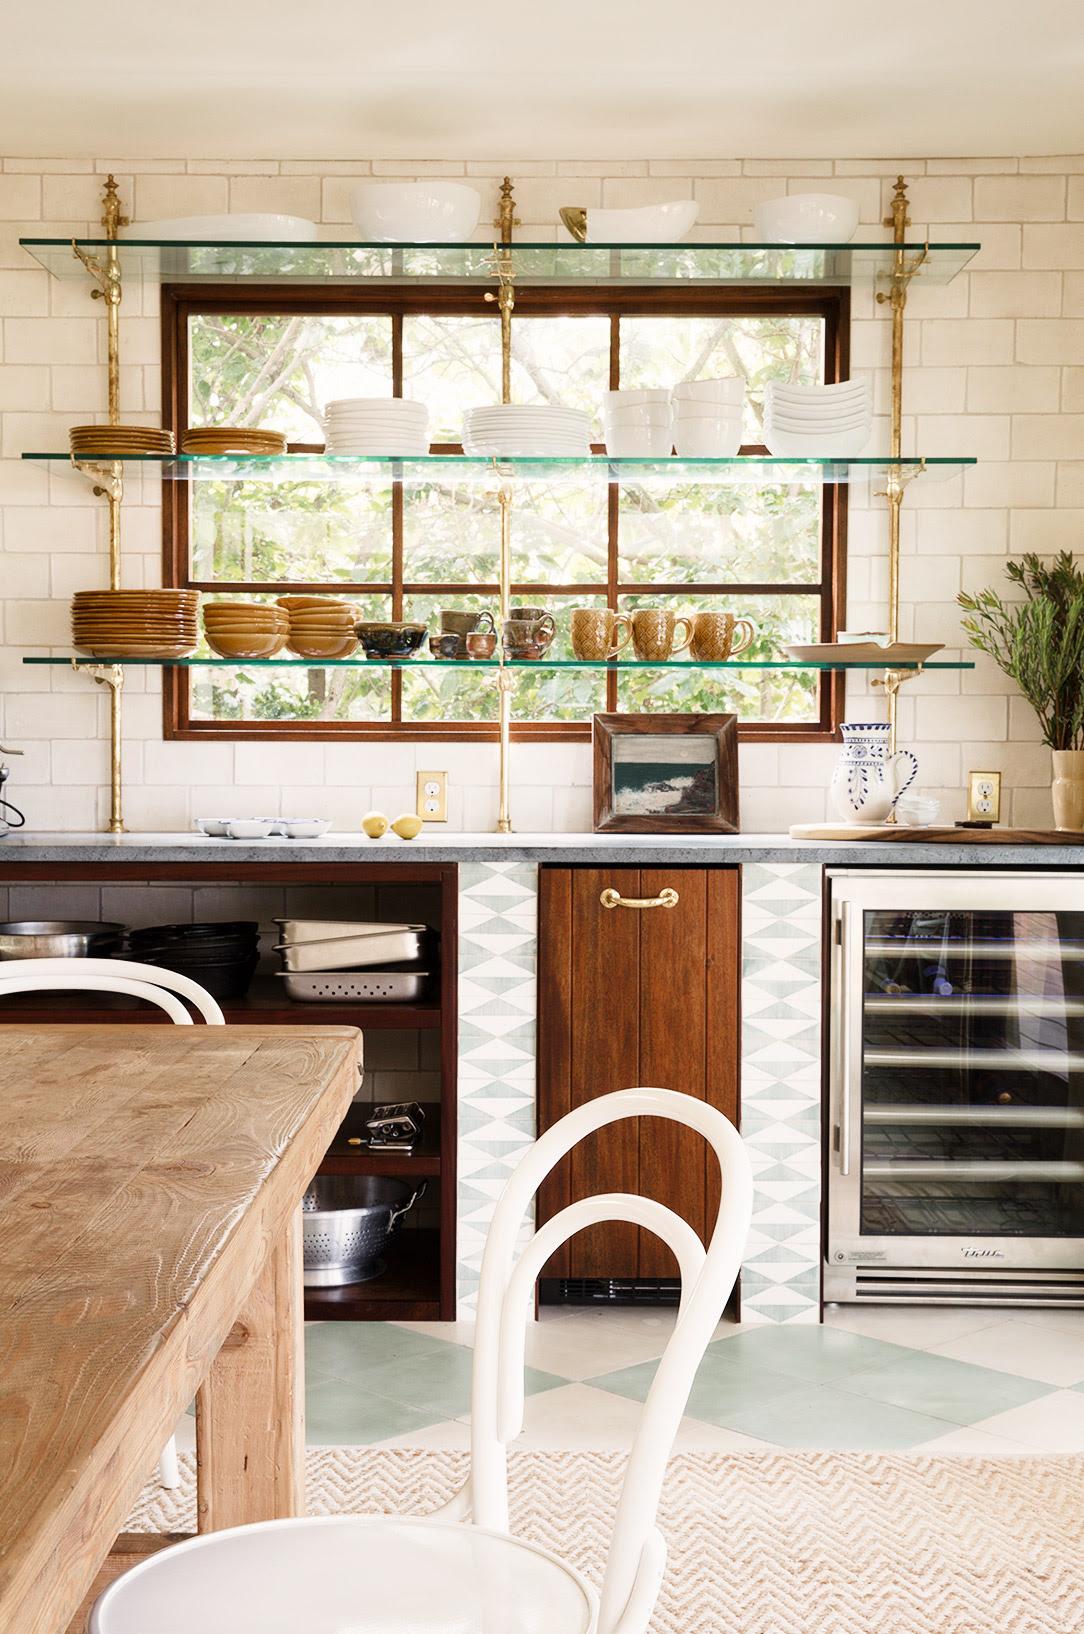 26 Kitchen Open Shelves Ideas | Decoholic